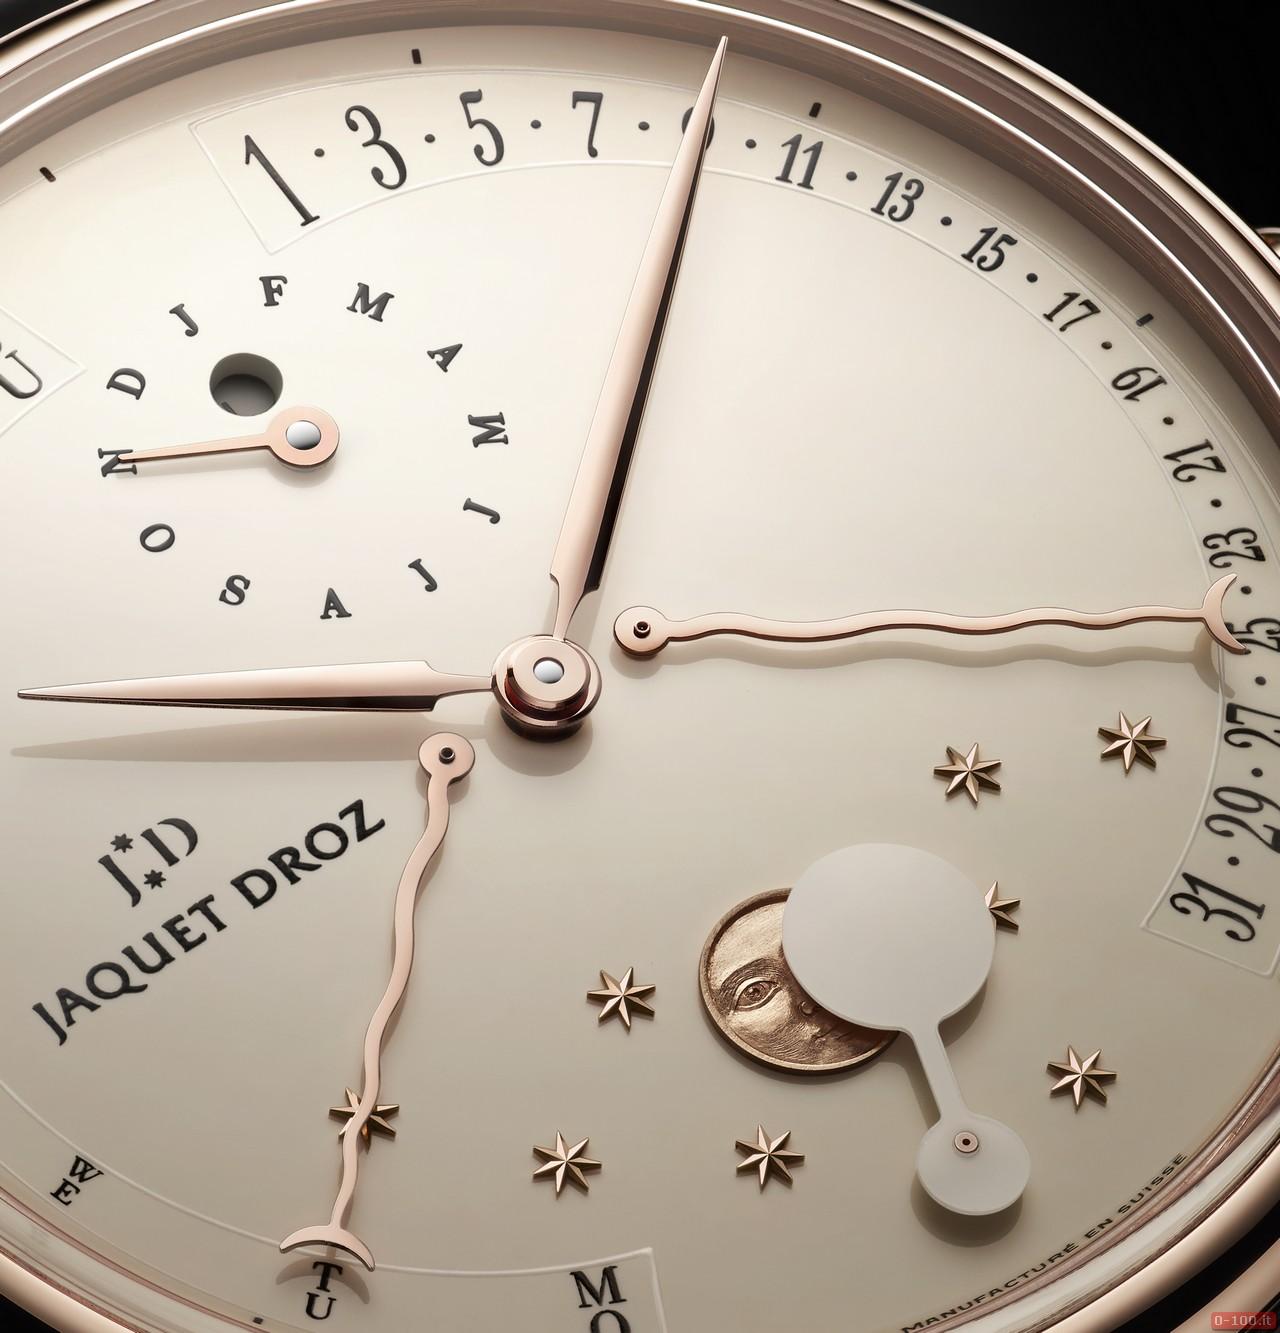 jaquet-droz-perpetual-calendar-eclipse-1005